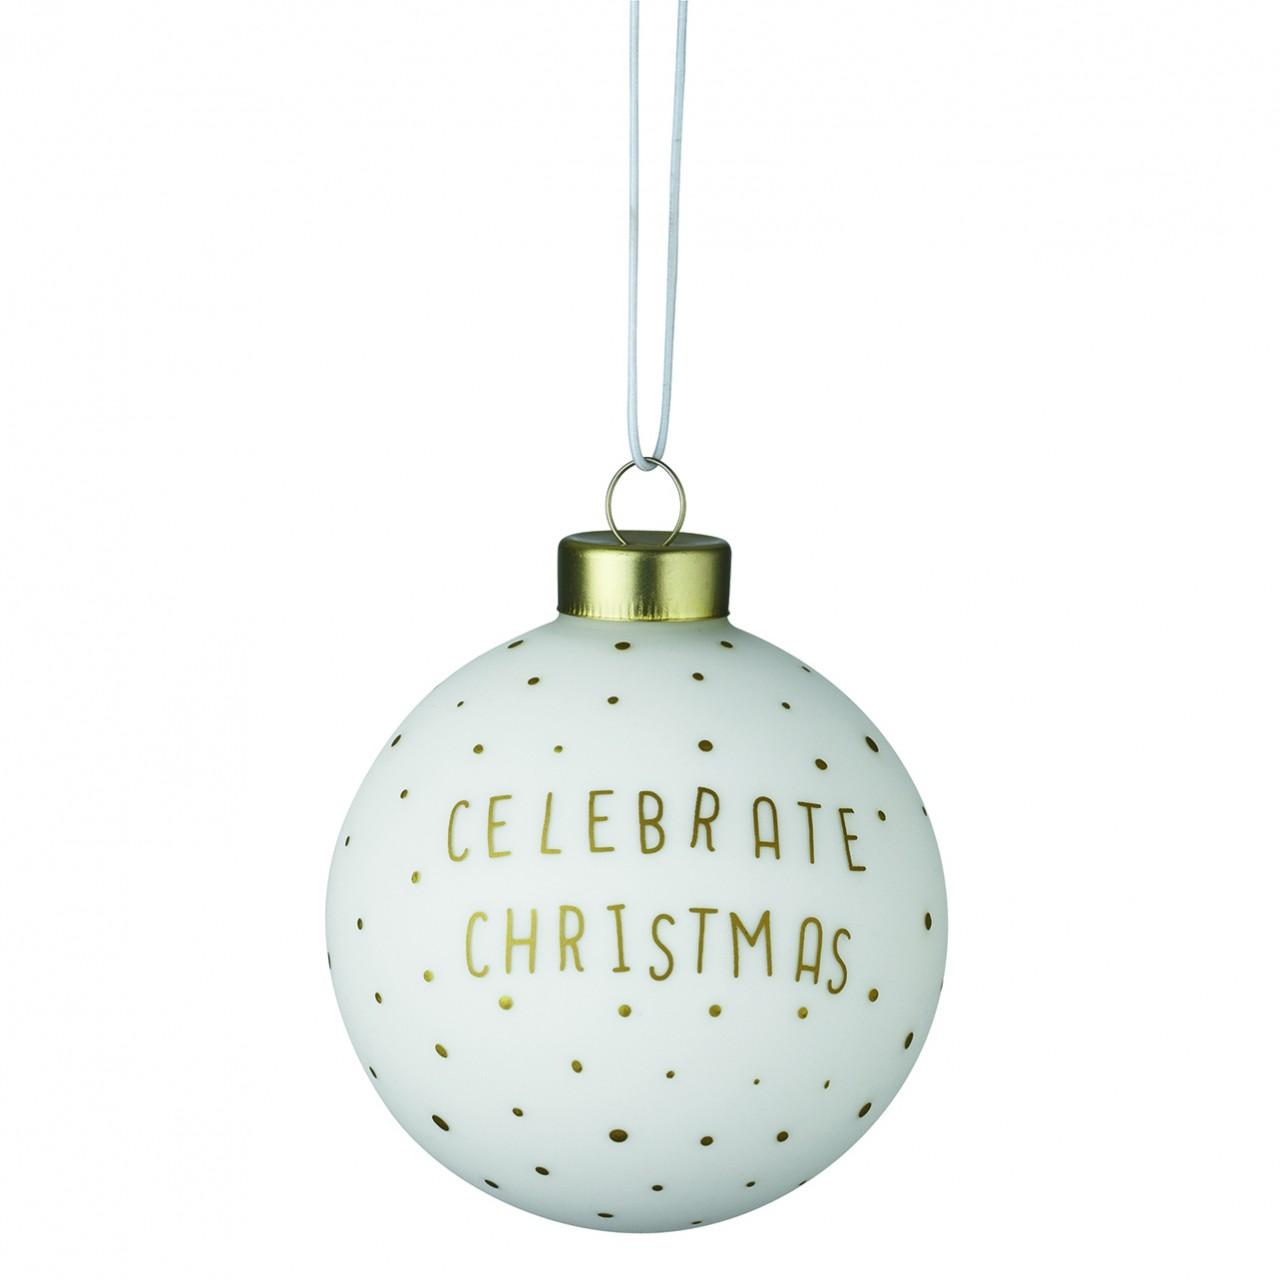 Christbaumkugeln Weiß Gold.Räder Weihnachtskugel Celebrate Christmas Weiss Gold